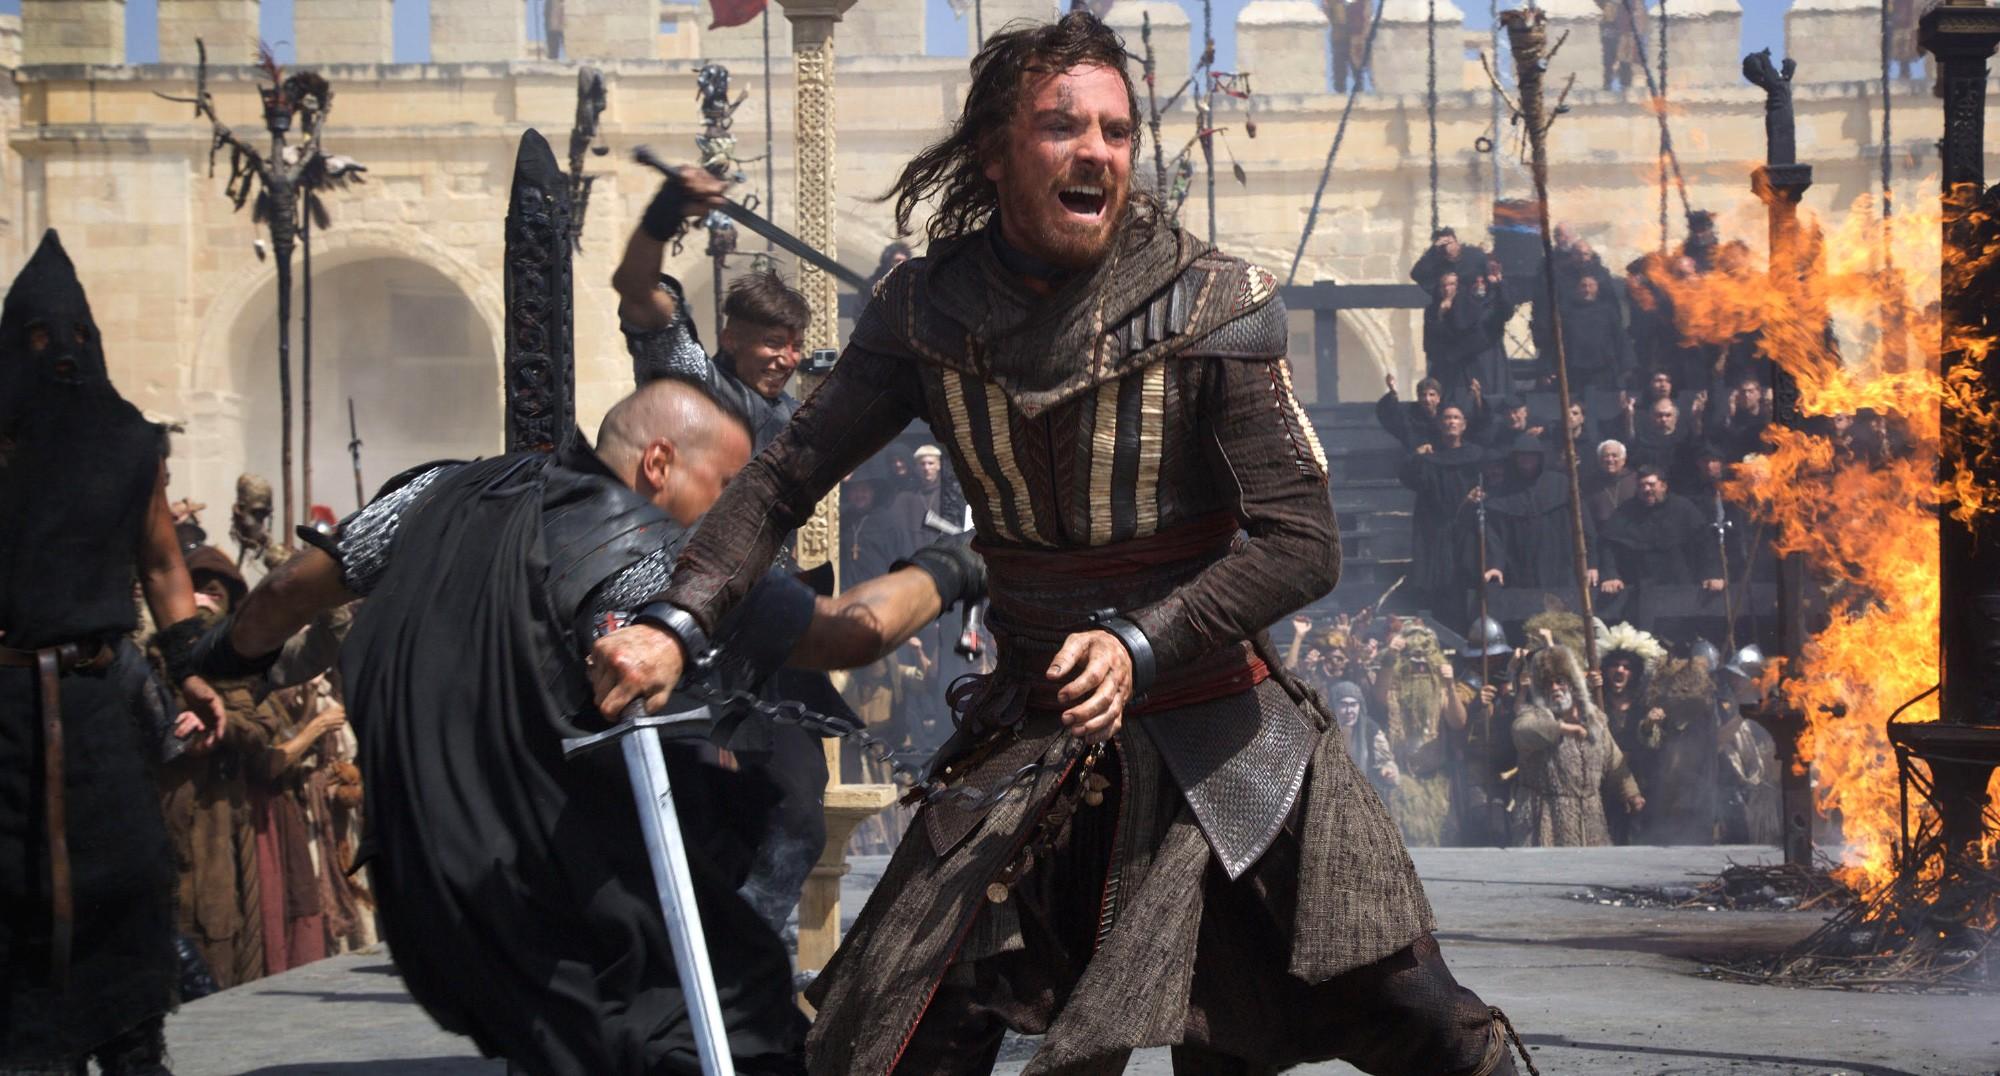 assassins-creed-gallery-02-gallery-image.jpg